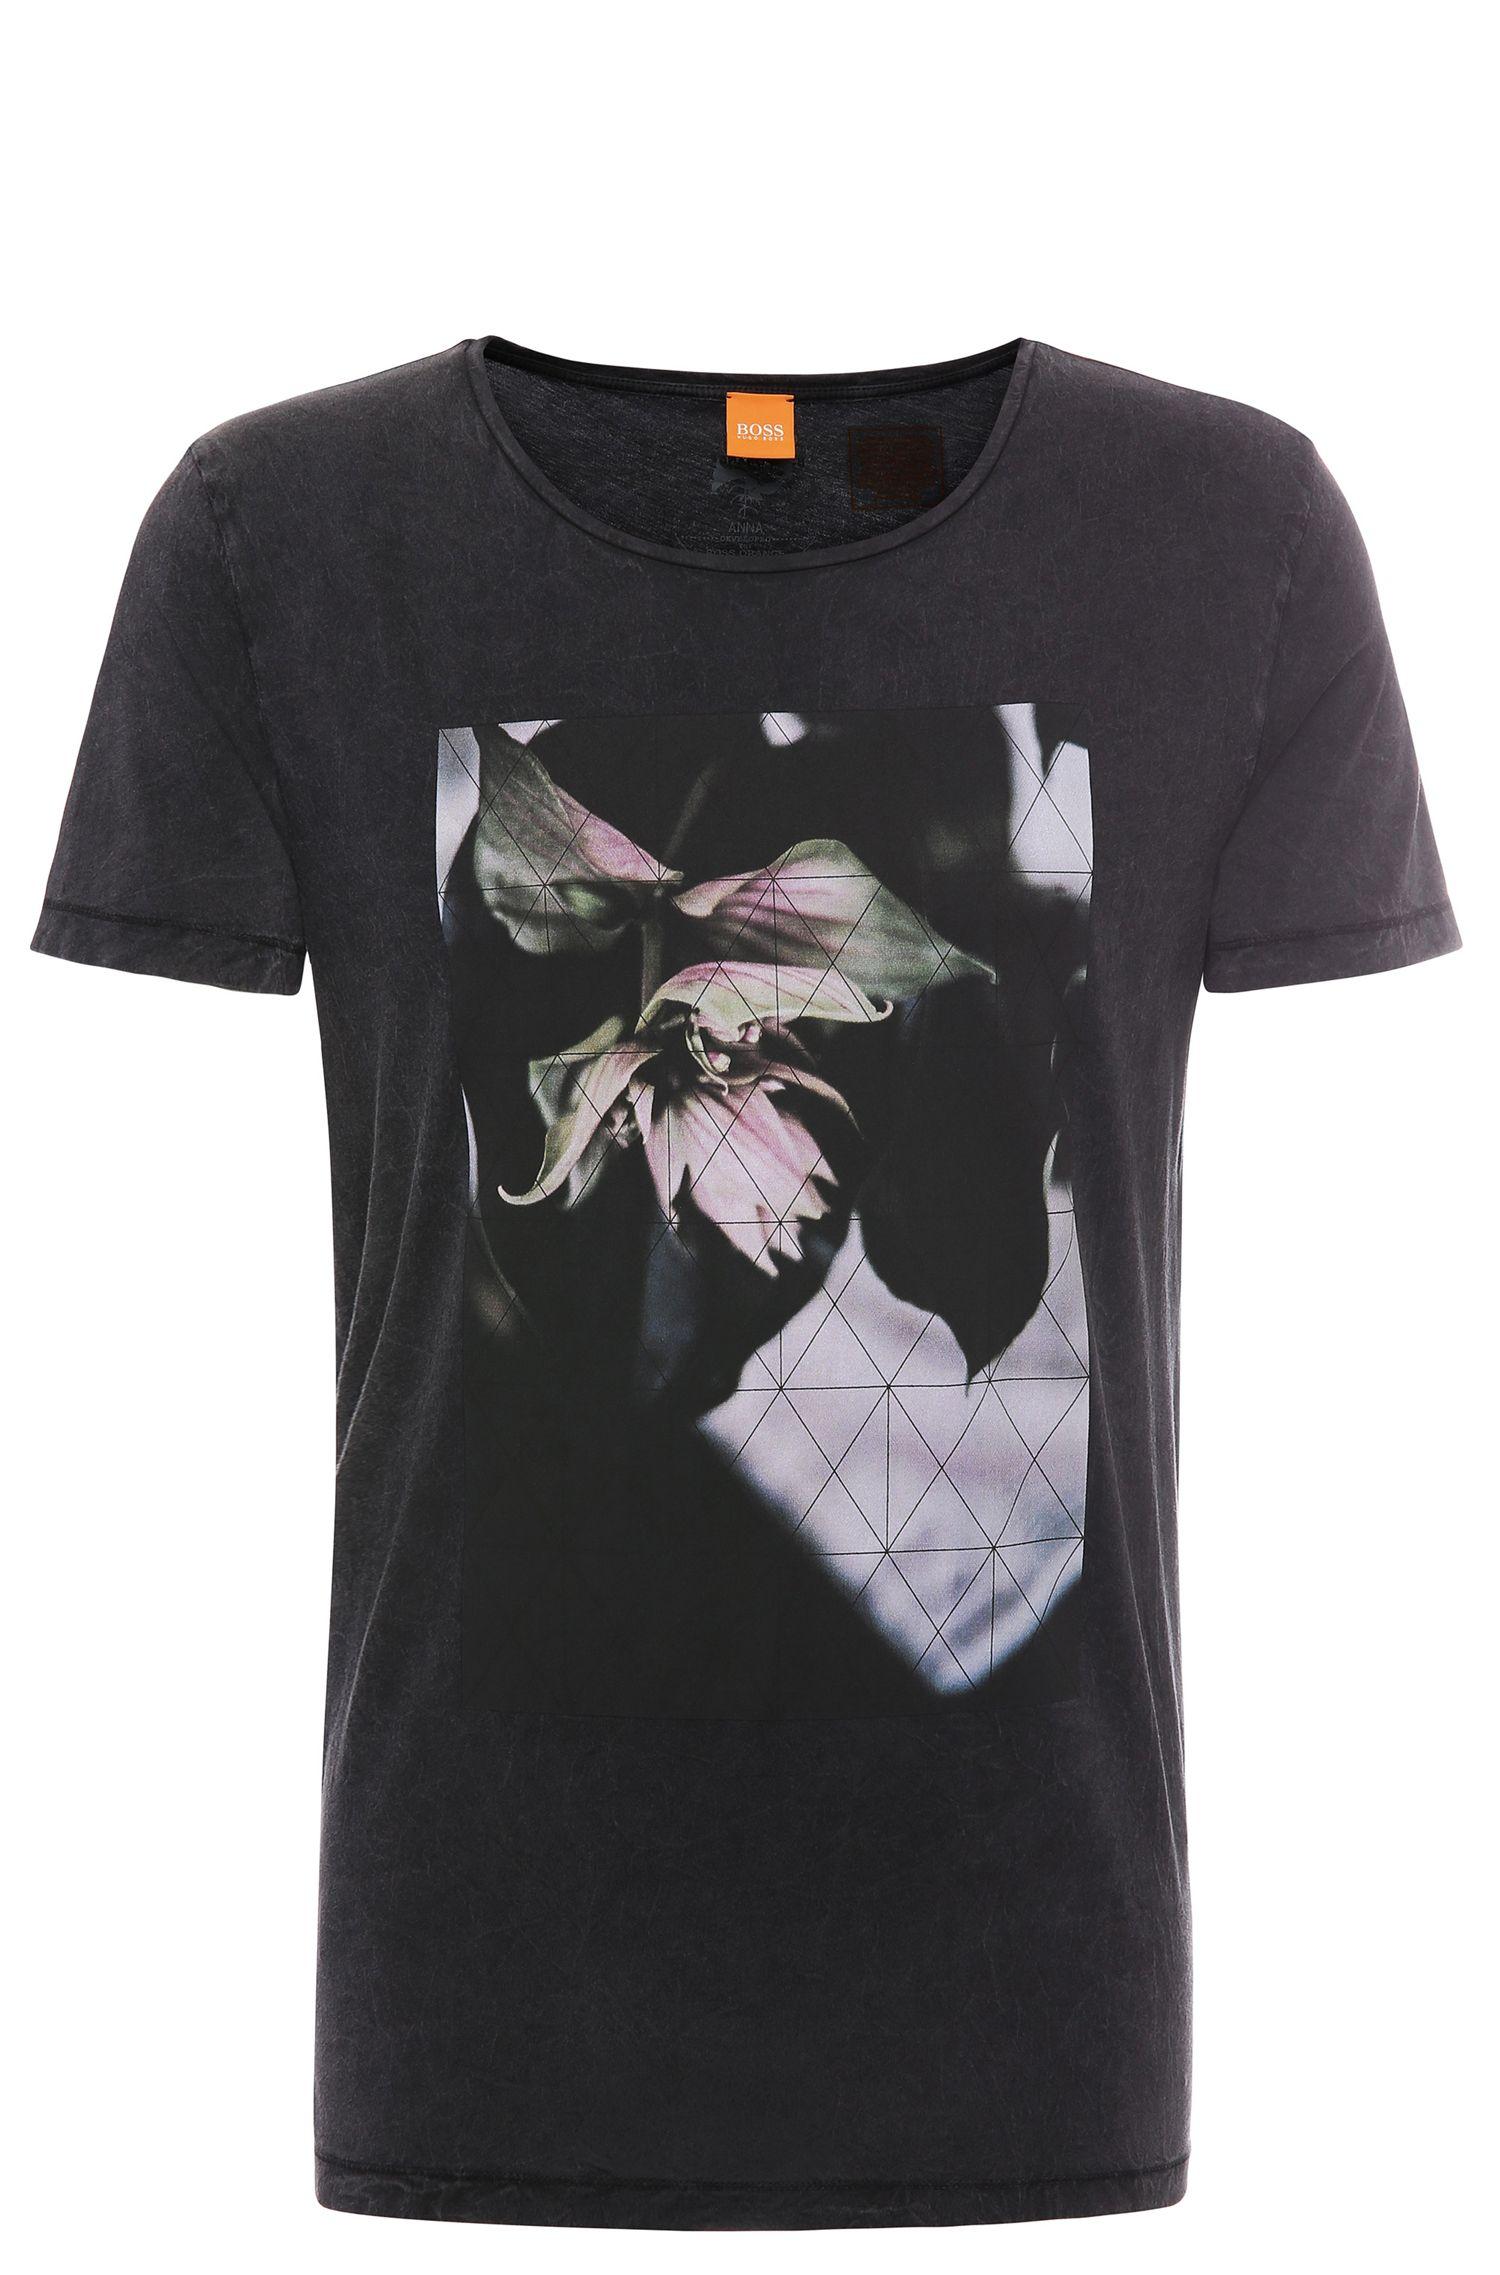 Cotton Lily Print T-Shirt | Torvind